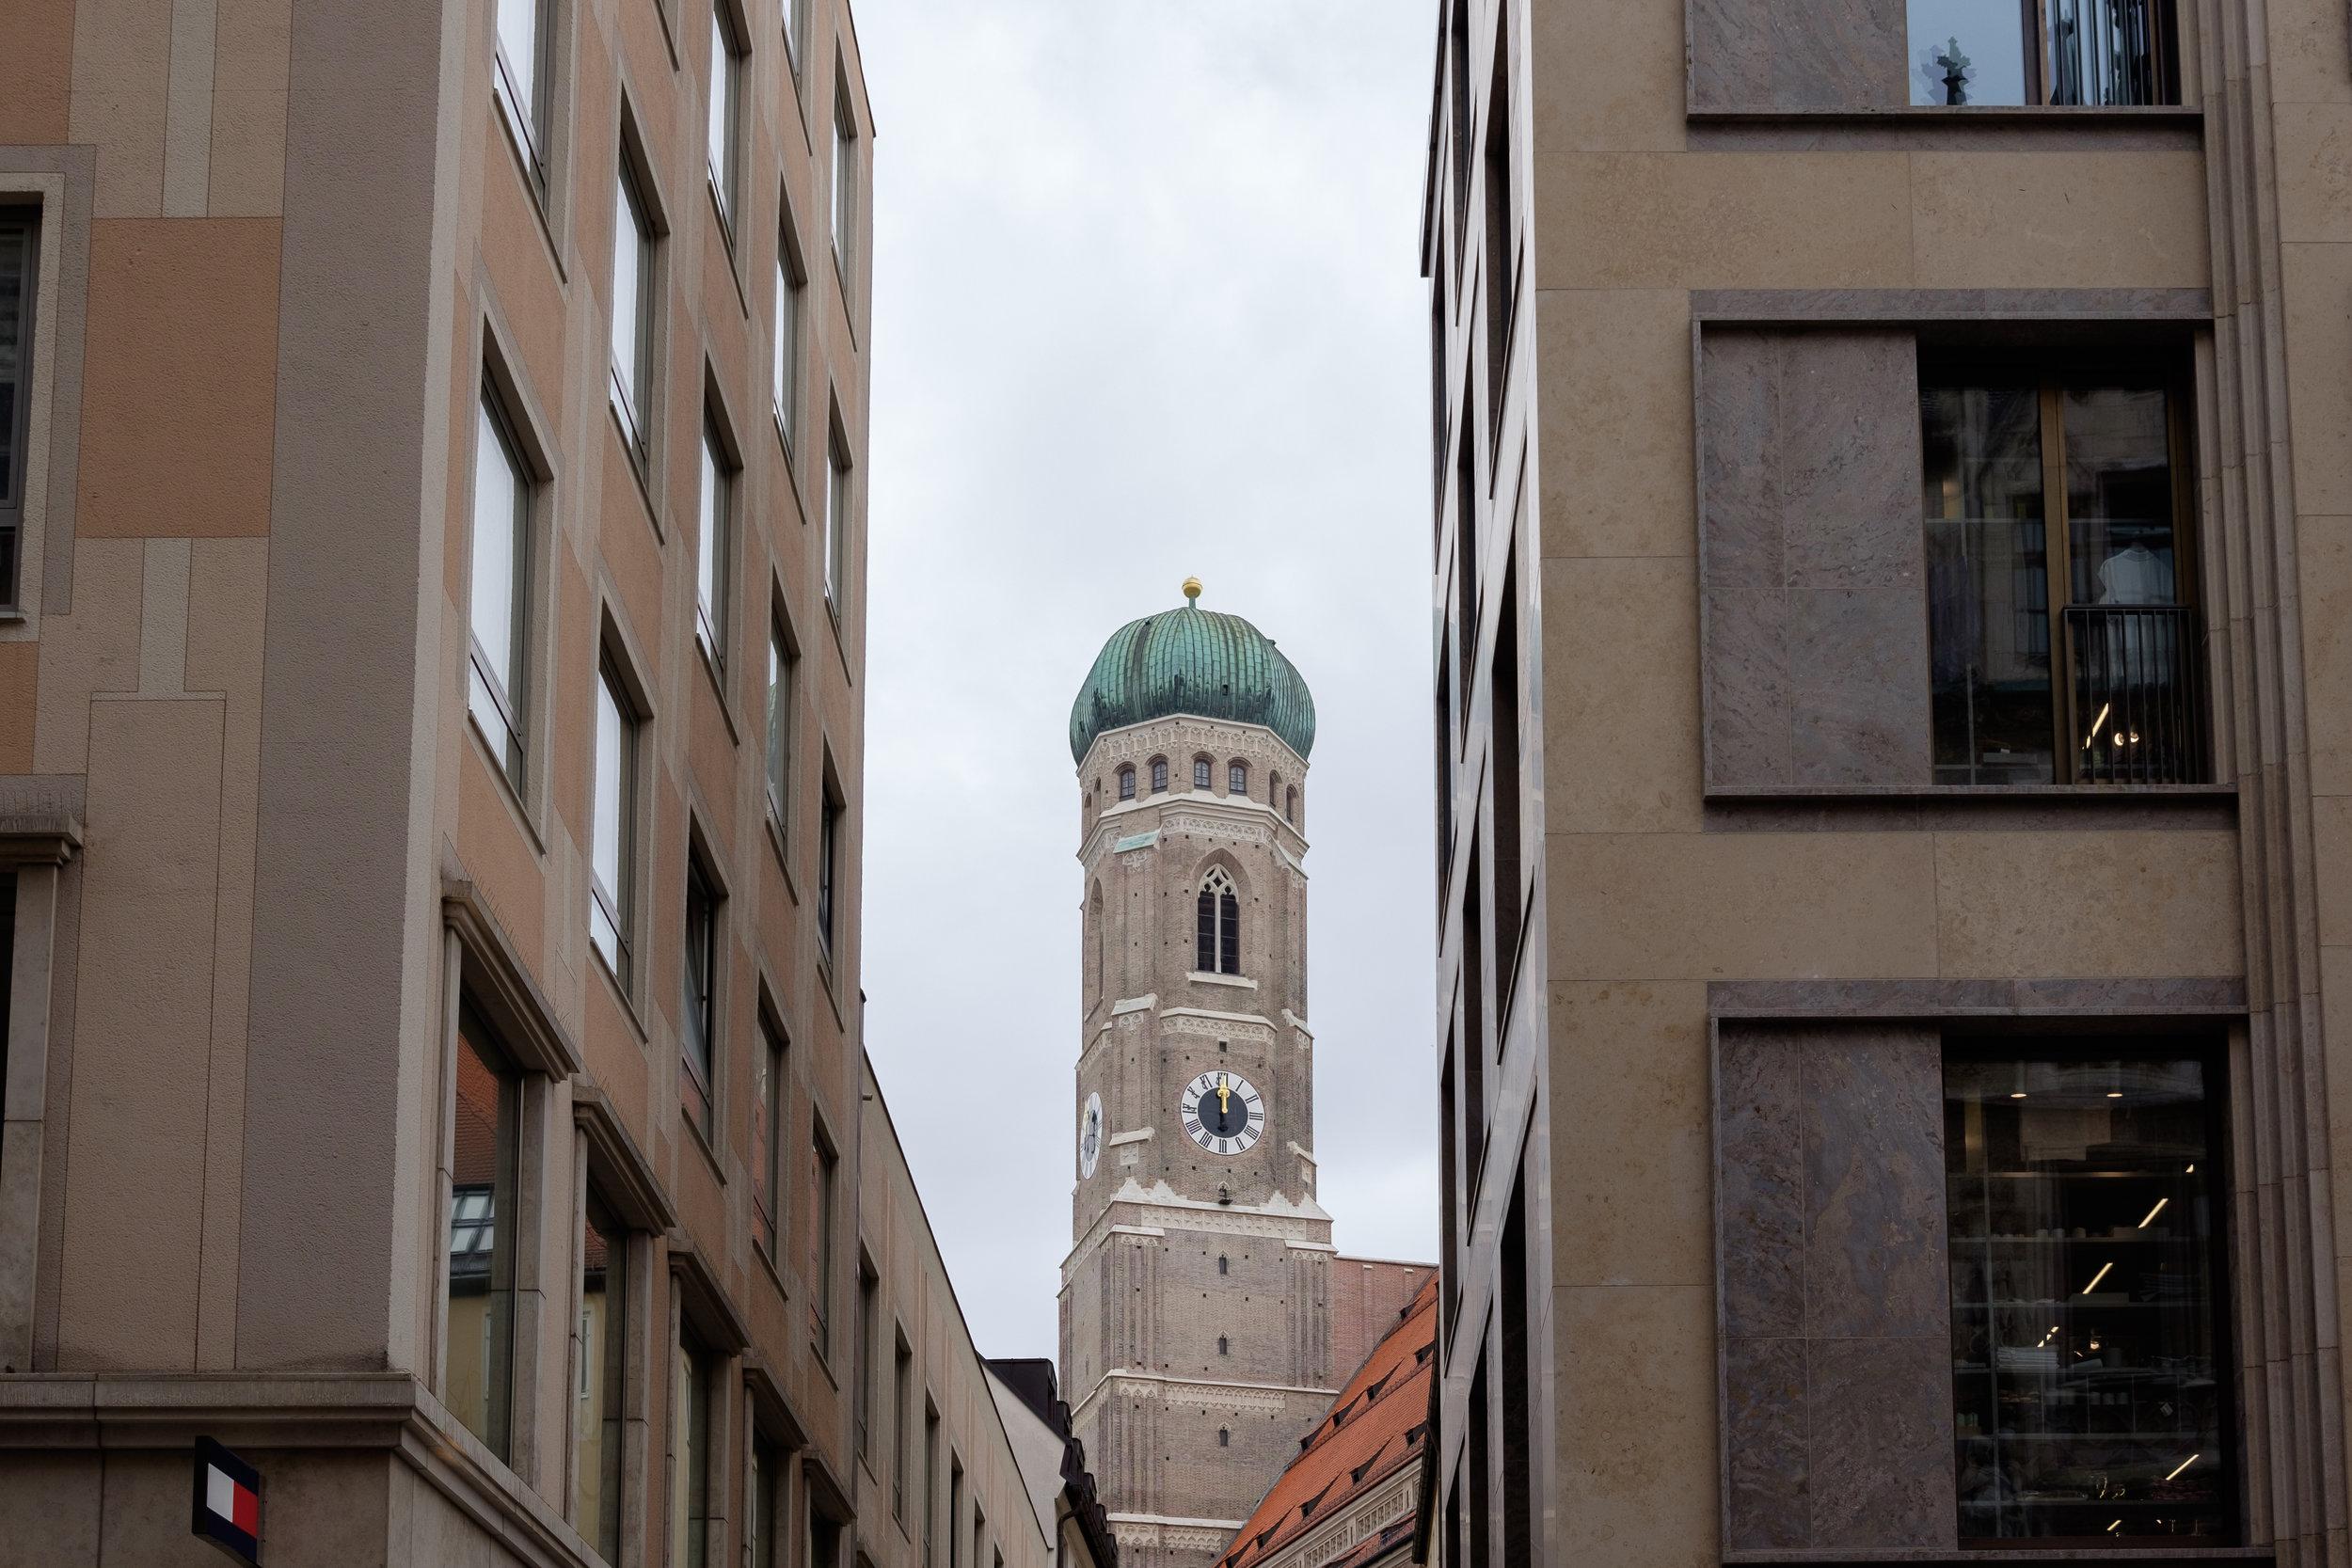 Victoria-Munich-Germany-0065.jpg